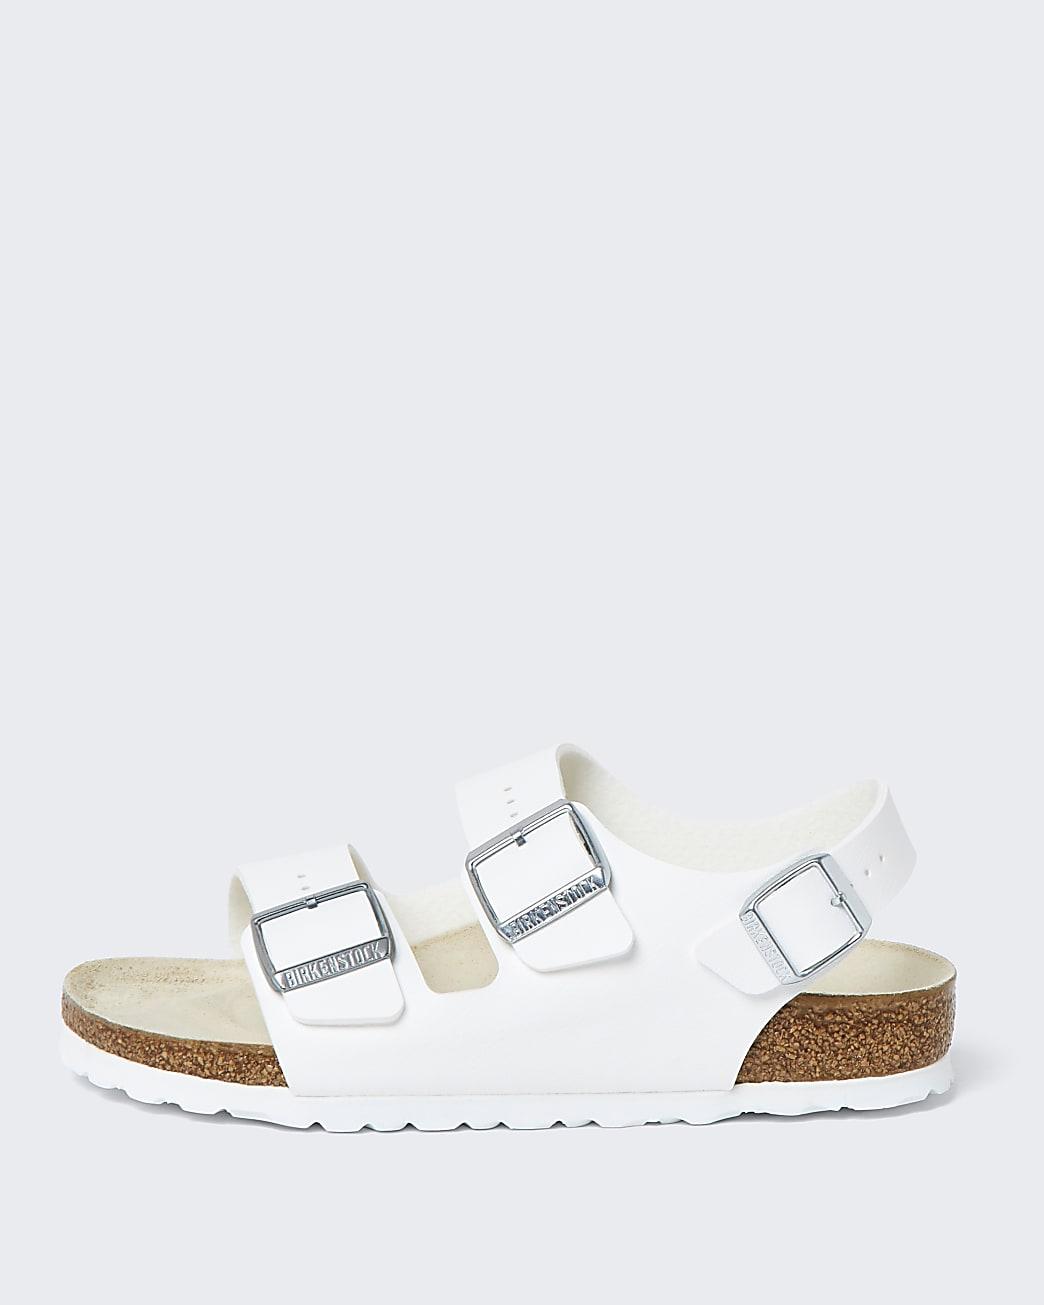 Birkenstock white triple strap sandals